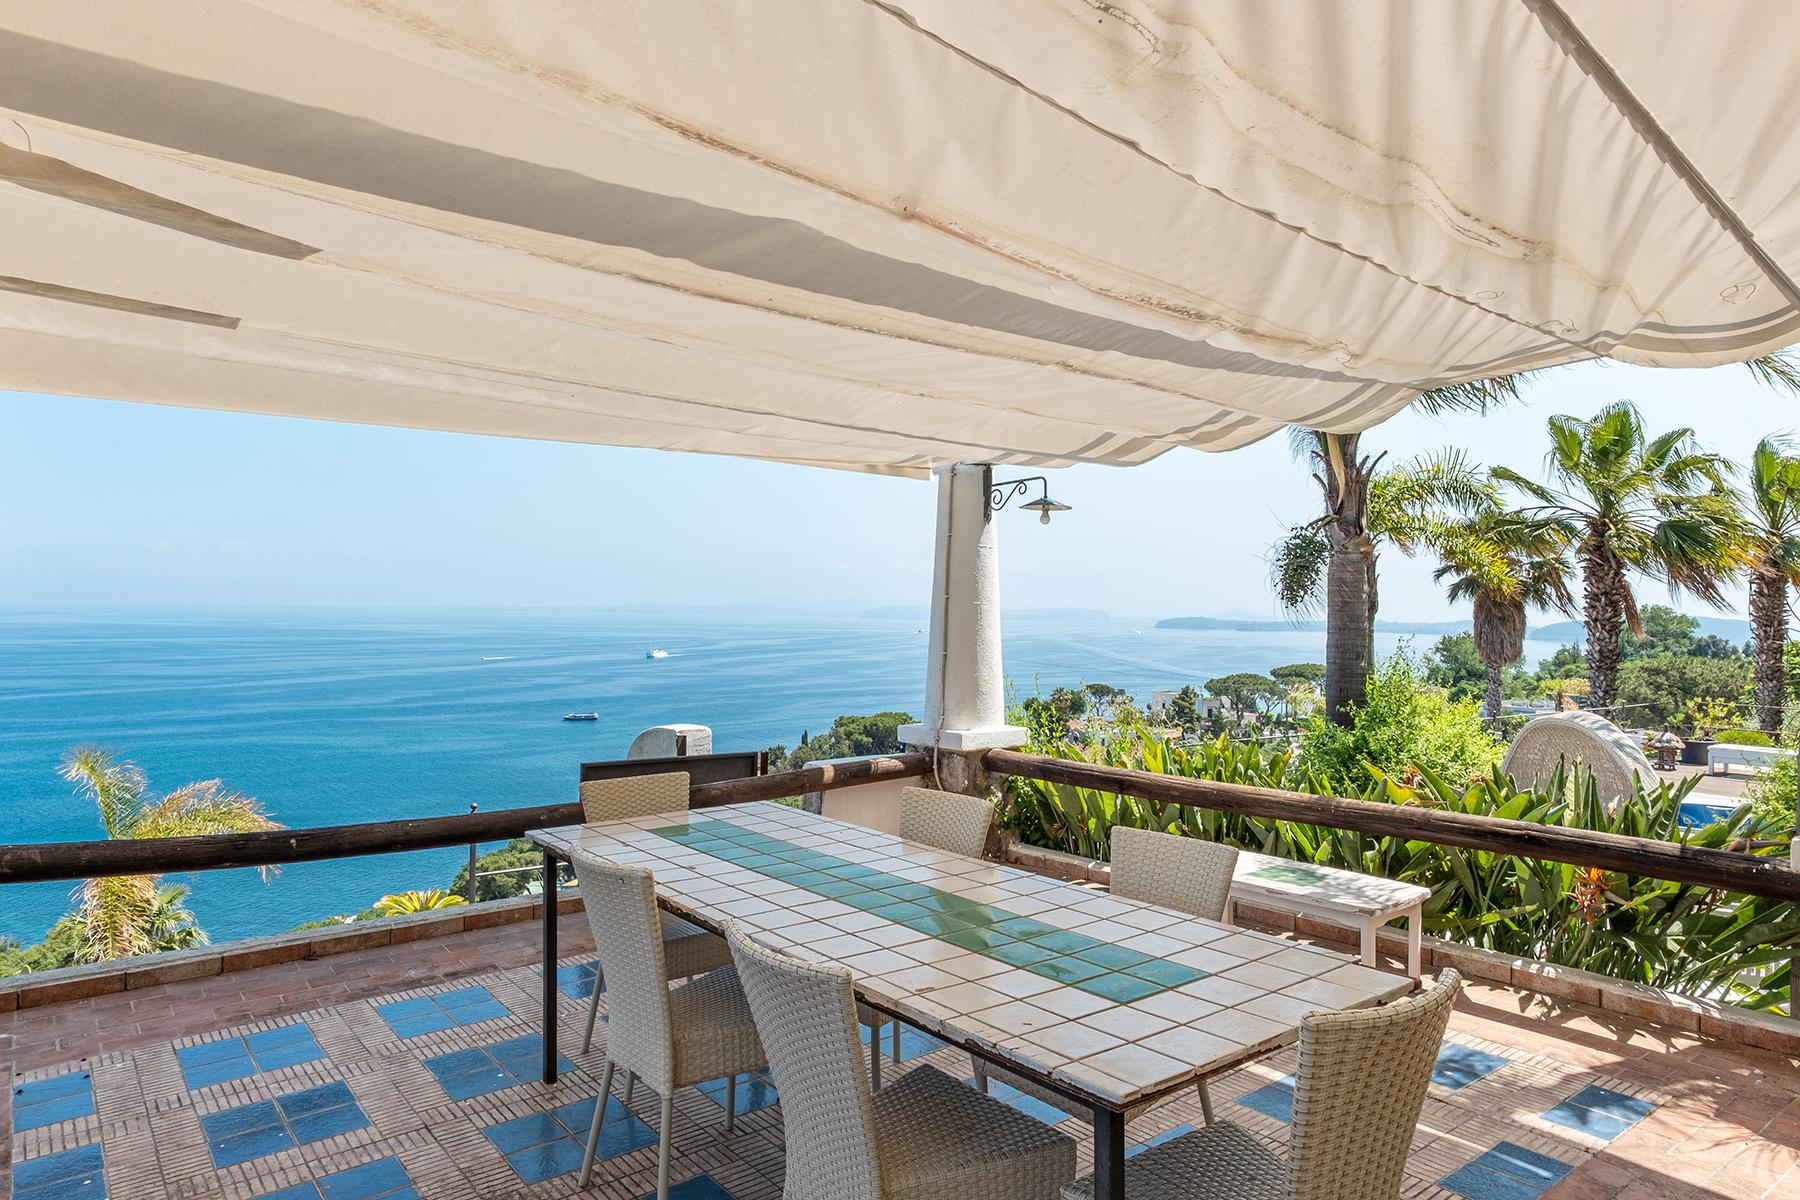 Villa in Vendita a Ischia: 5 locali, 500 mq - Foto 10